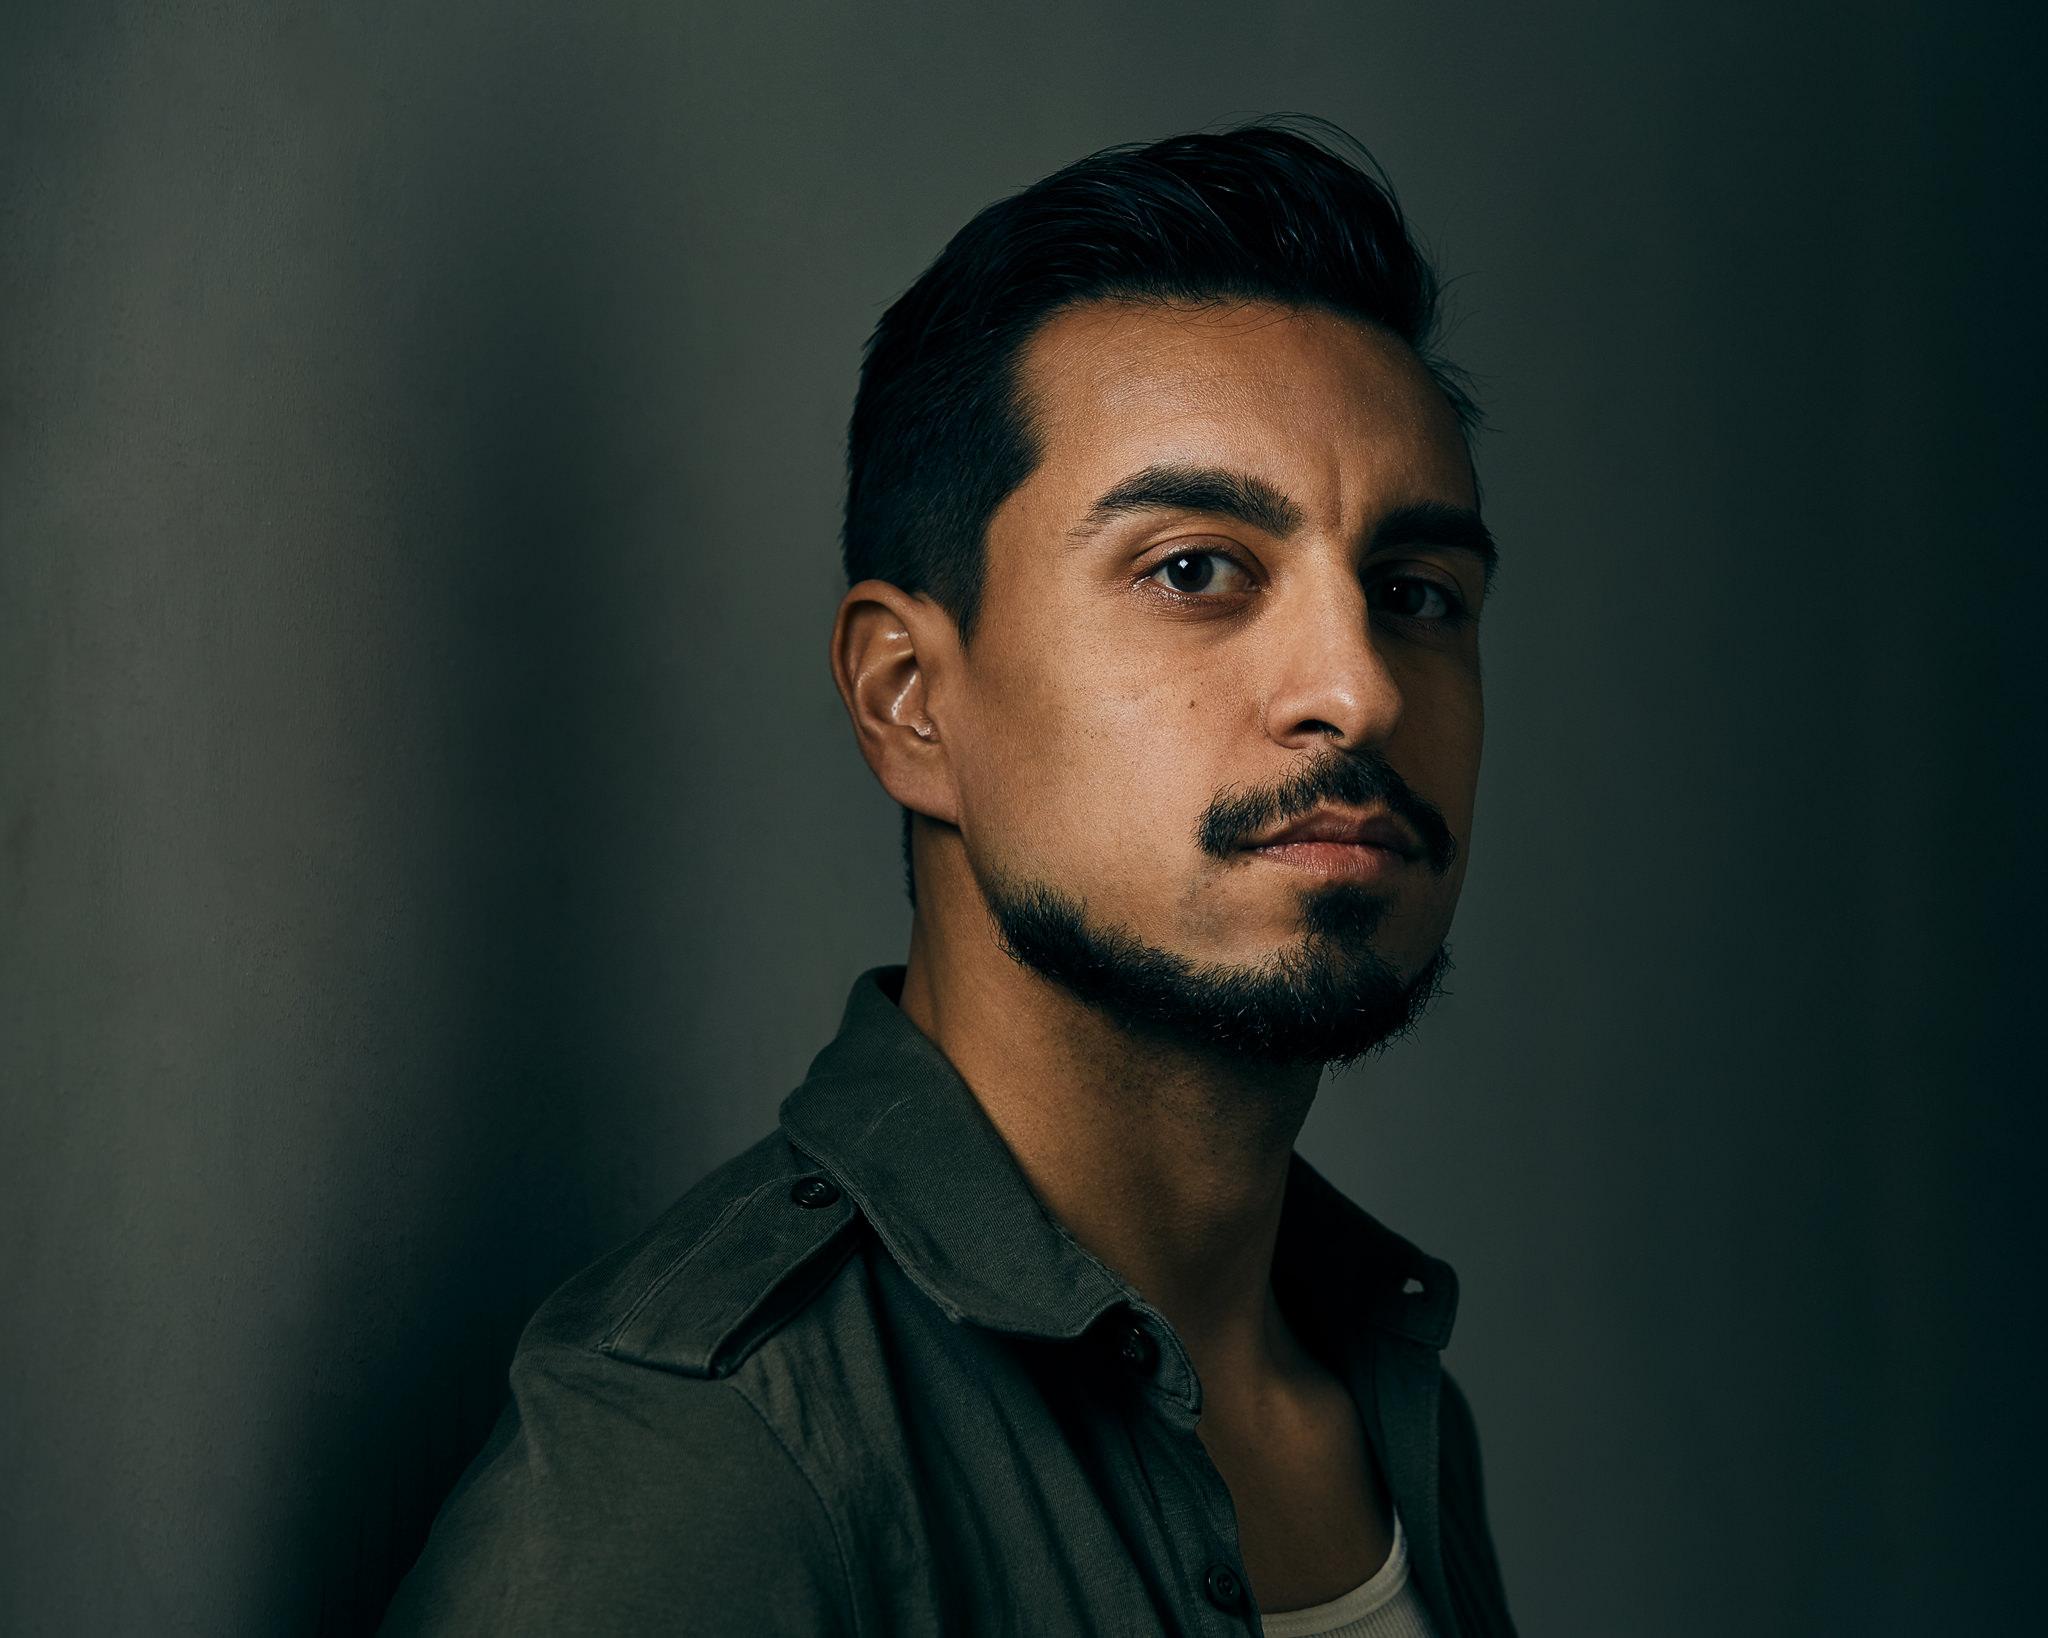 Professional headshot of male actor in studio.